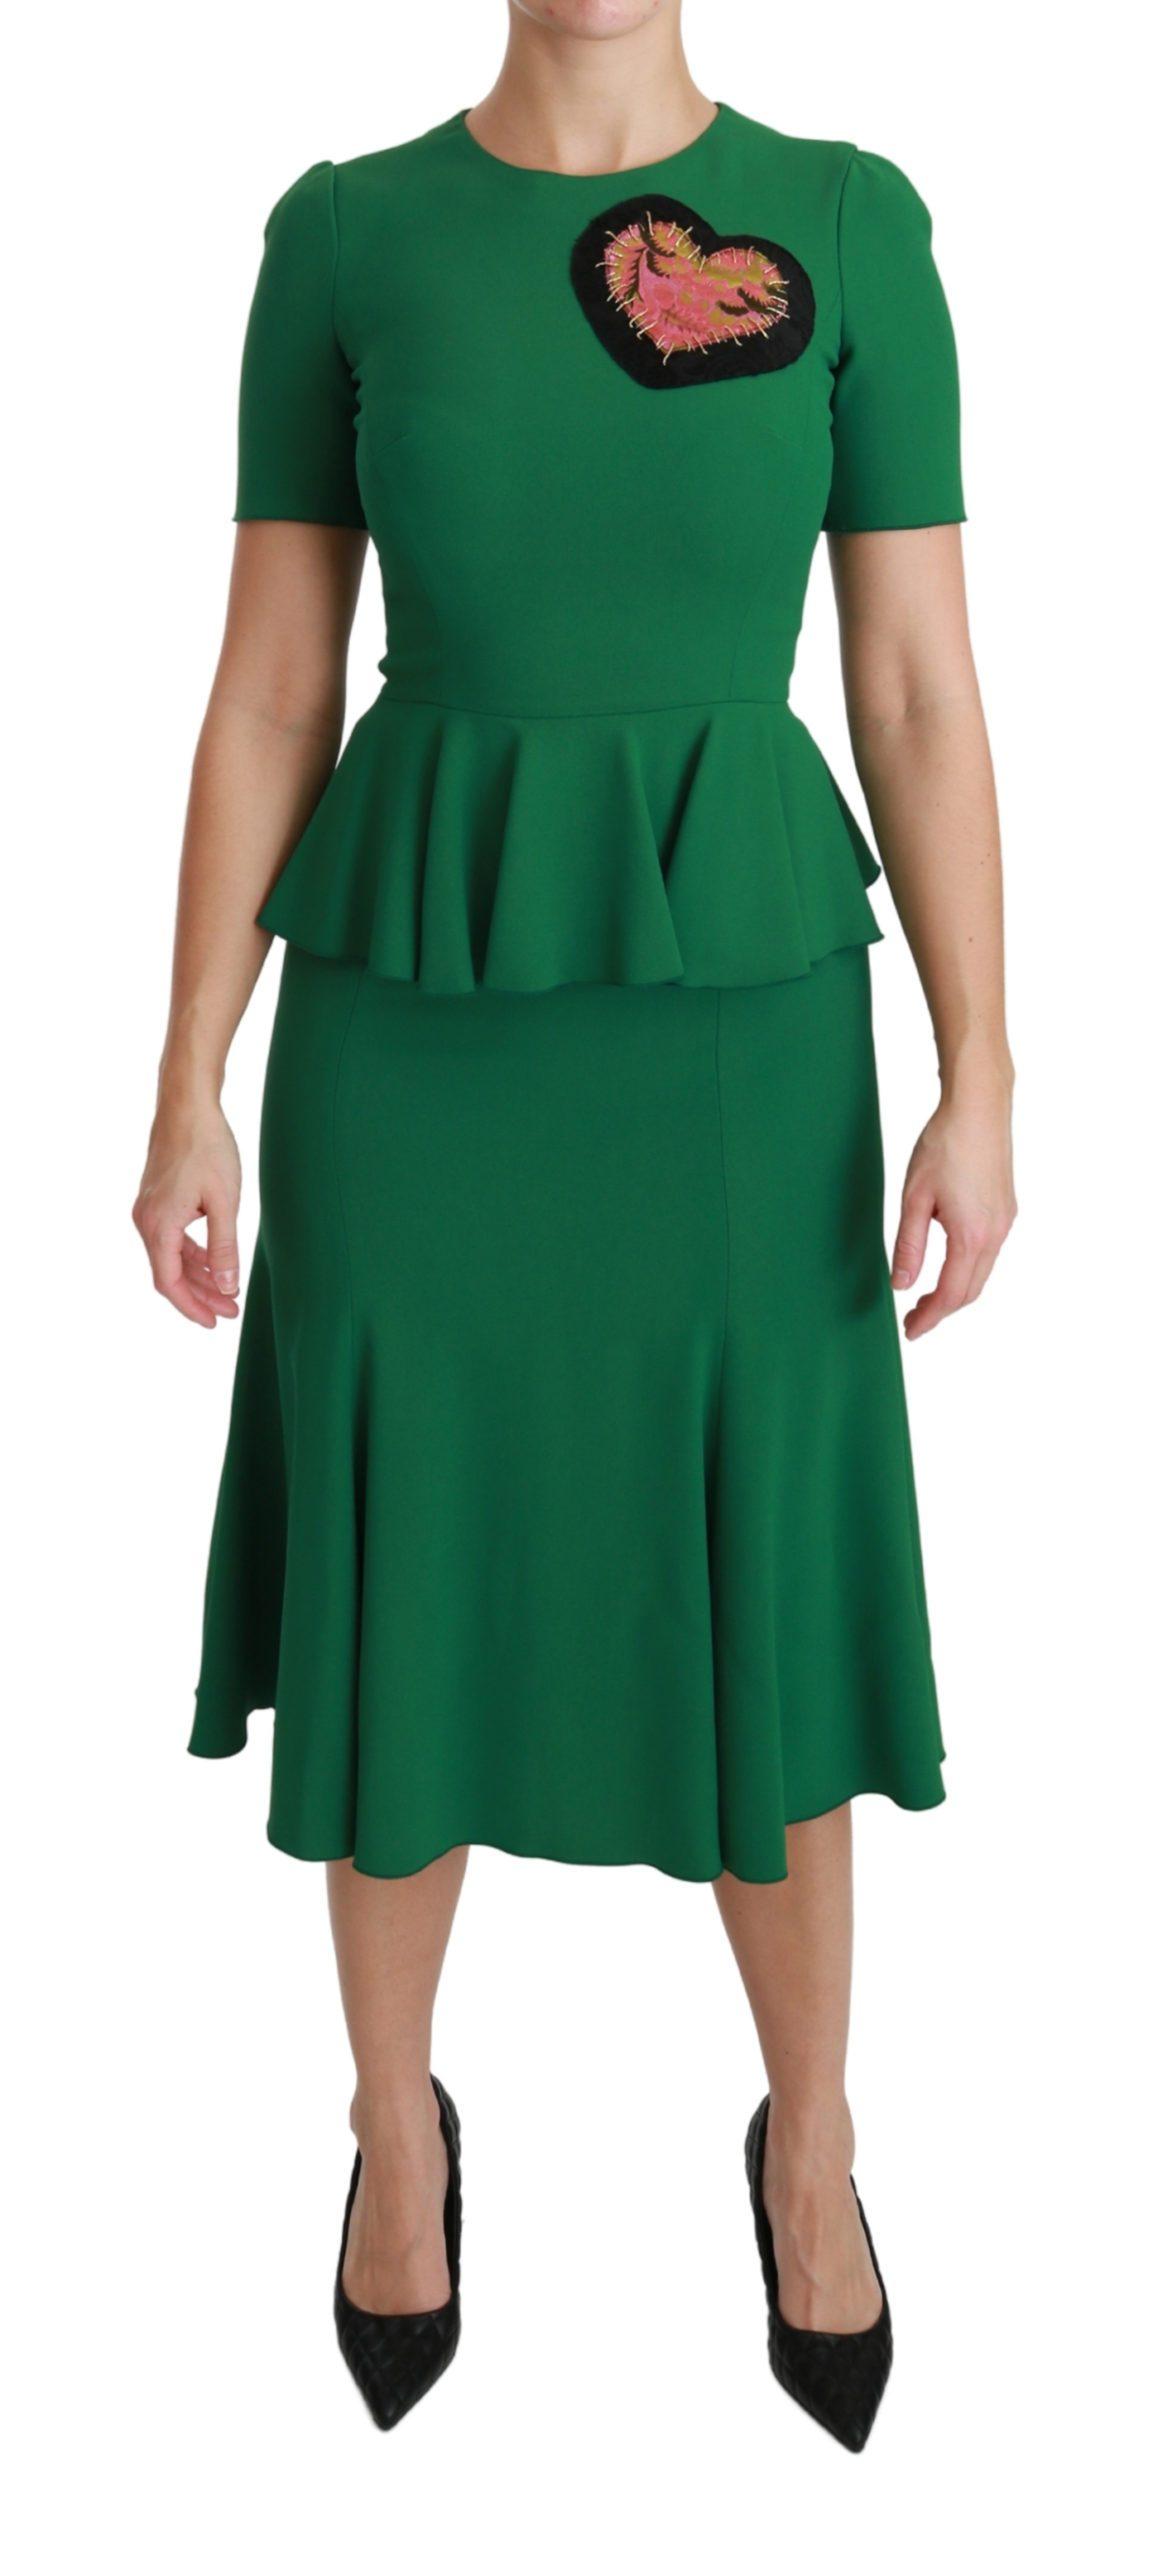 Dolce & Gabbana Women's Heart Patch Mermaid Midi Dress Green DR2511 - IT38   S